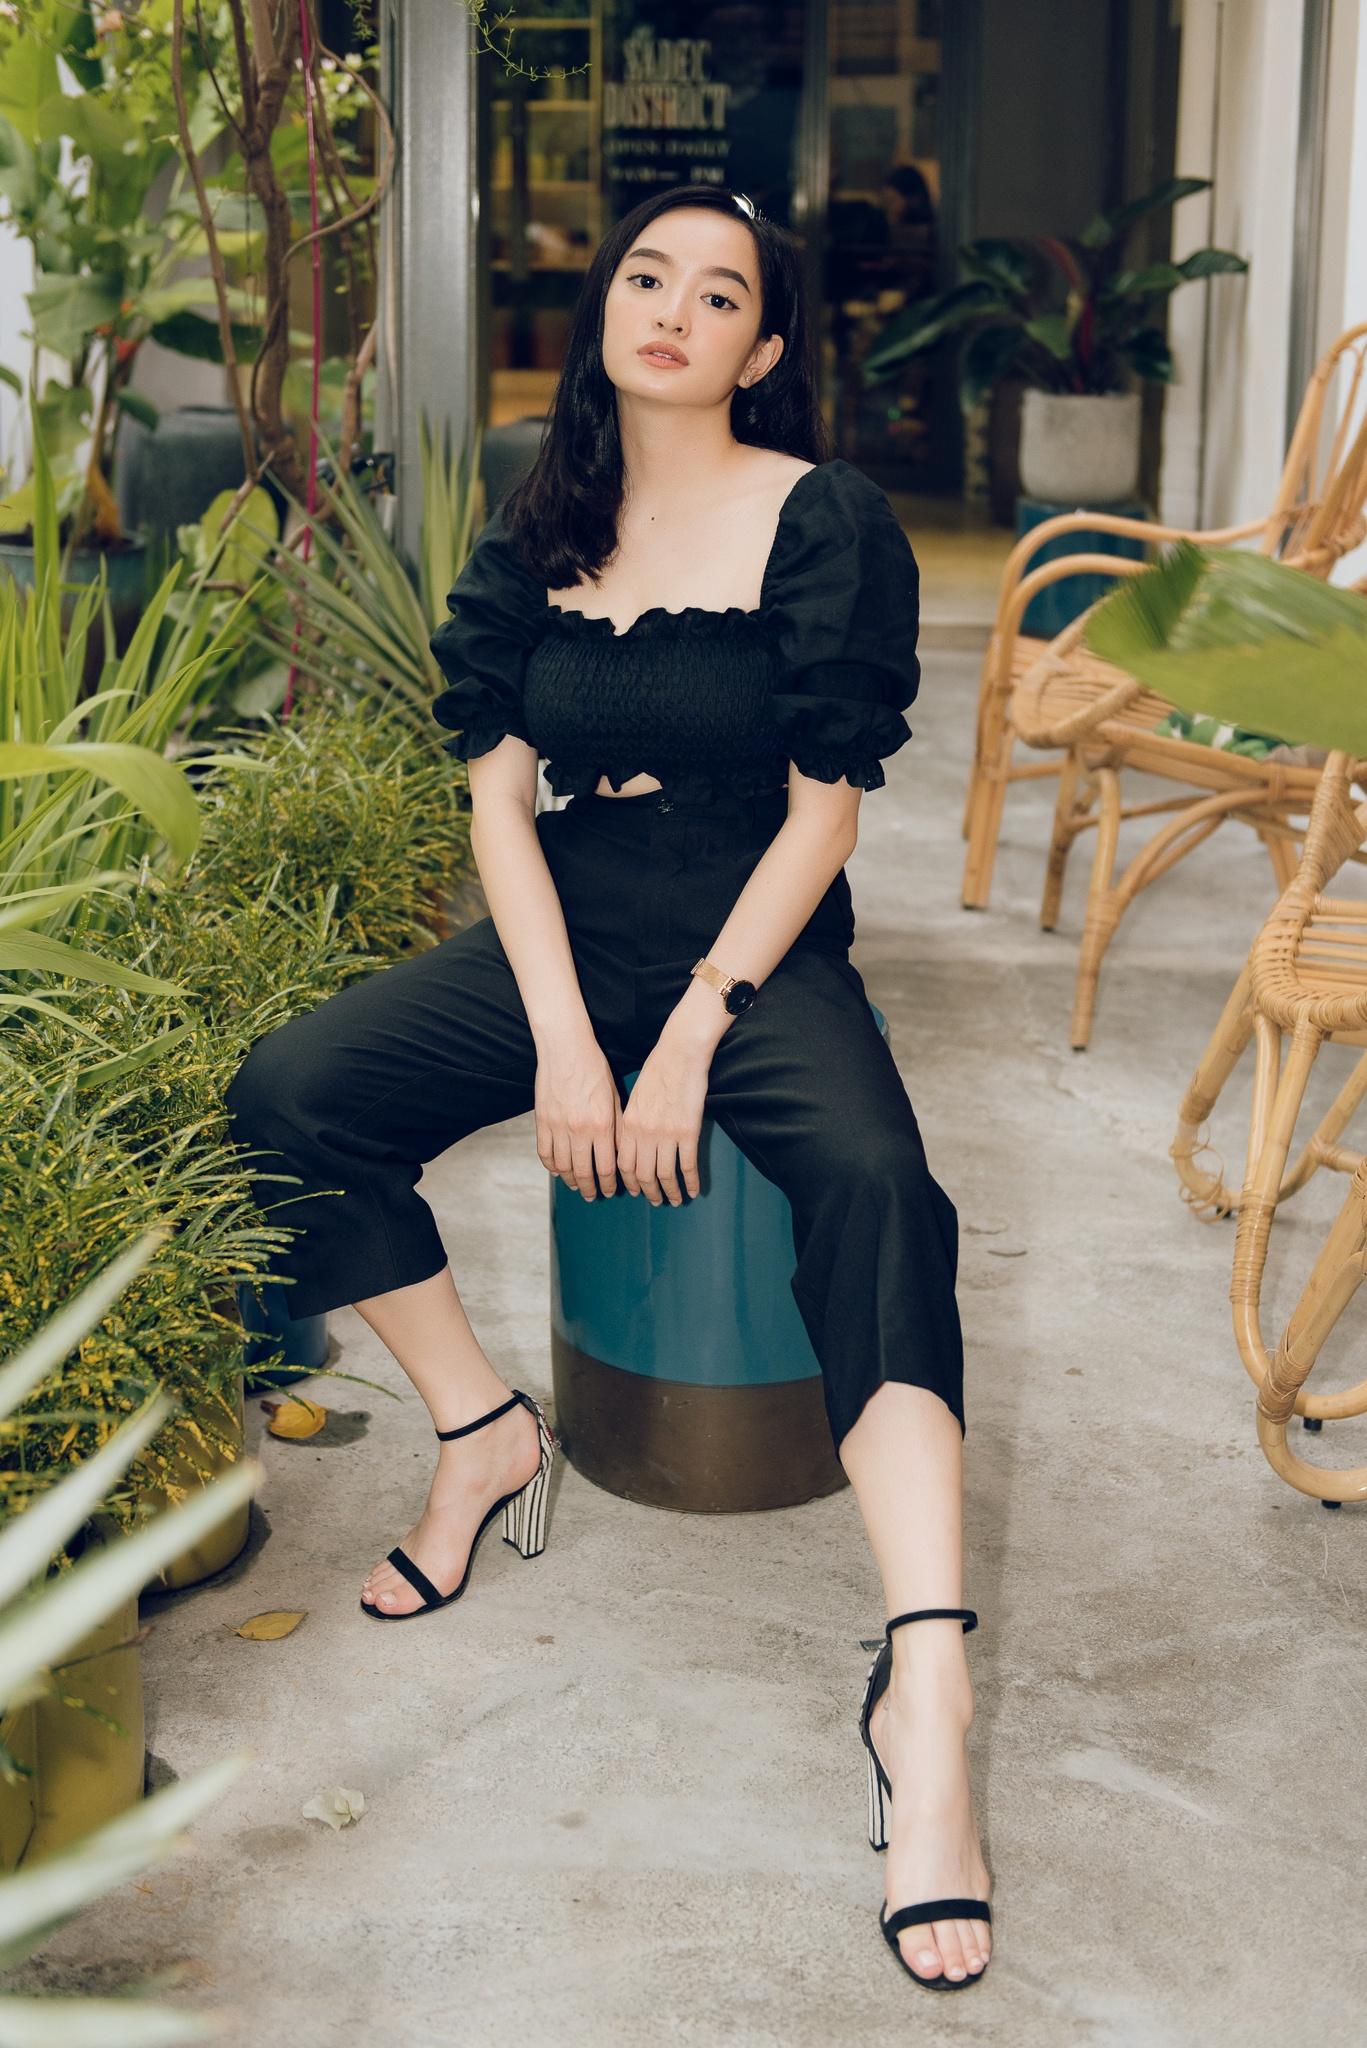 Kaity Nguyen: 'Doi khi toi kho chiu vi bi ba kiem soat cat-xe' hinh anh 23